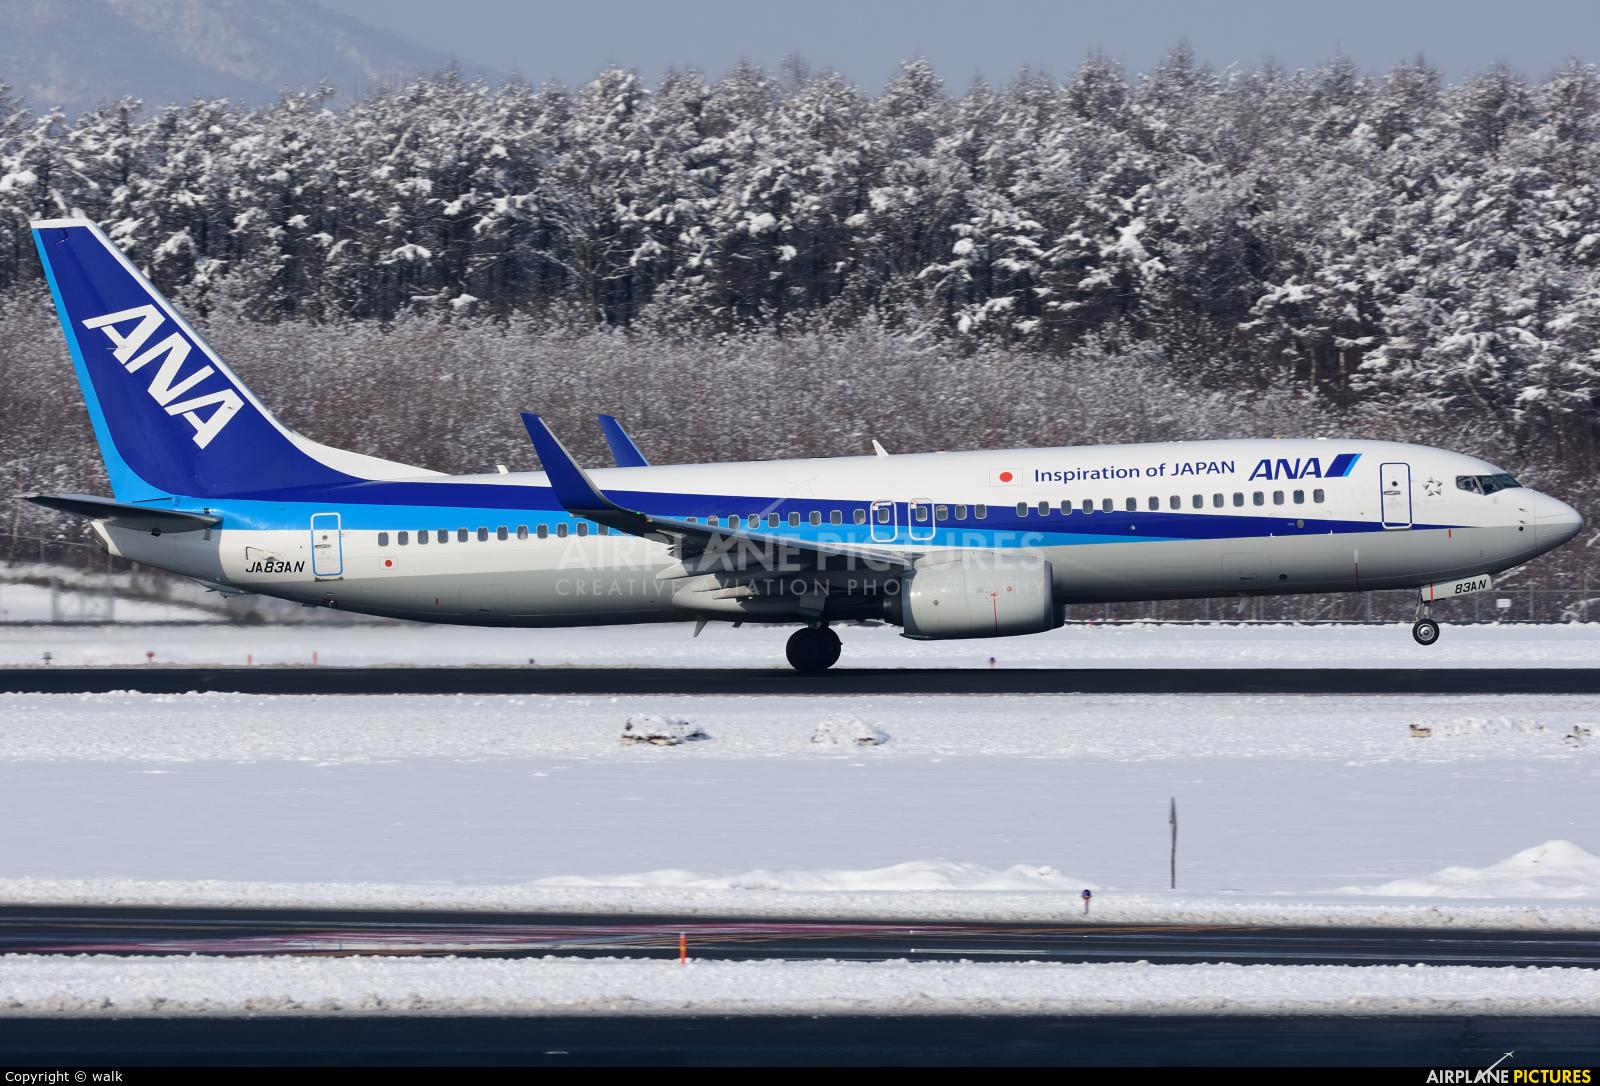 ANA - All Nippon Airways JA83AN aircraft at New Chitose